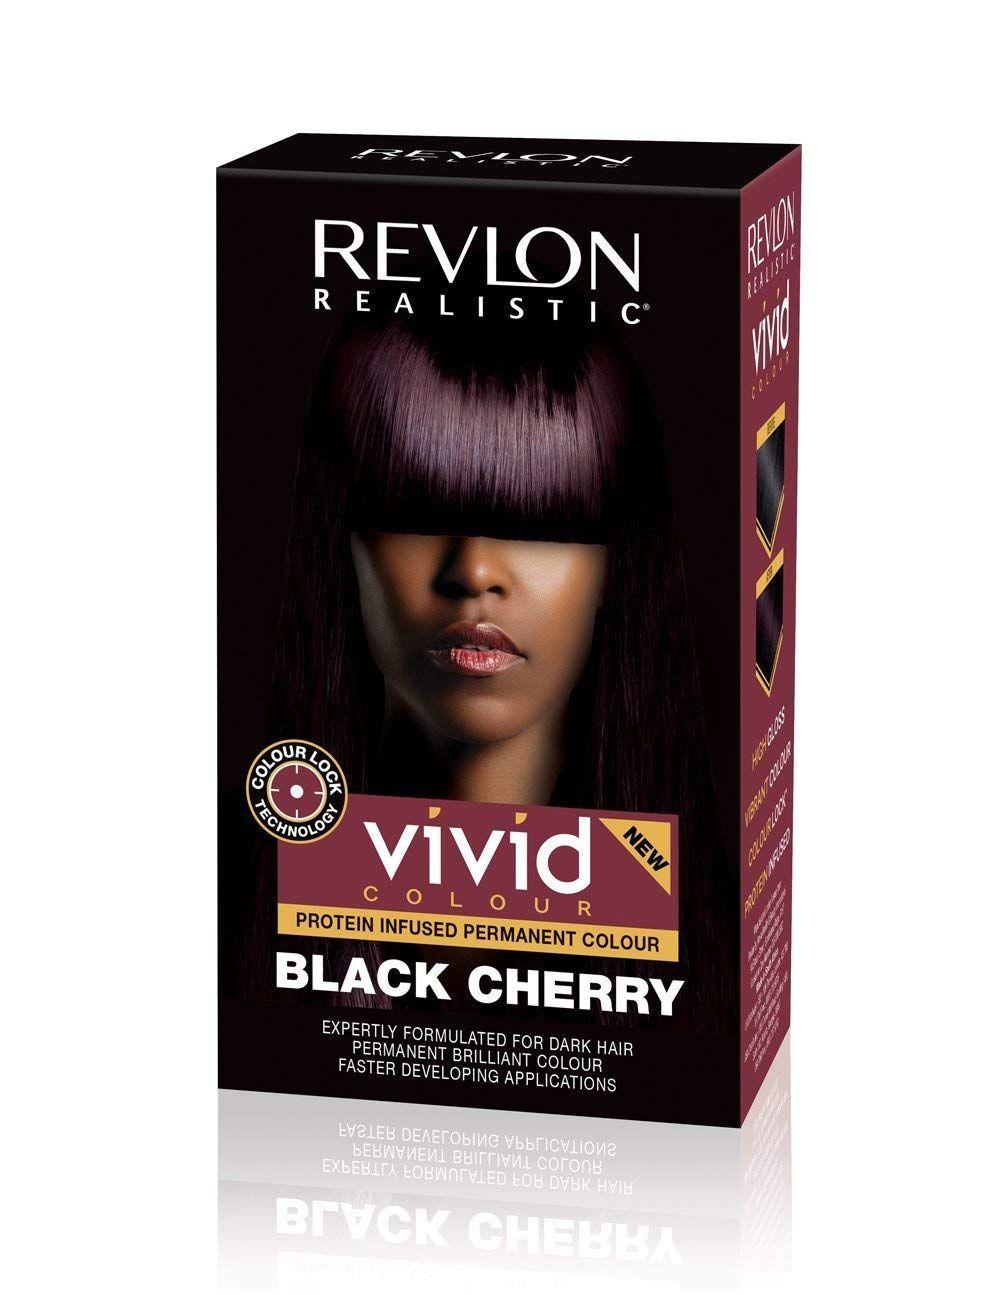 Revlon Realistic Vivid Colour Protein Infused Permanent Color Hair